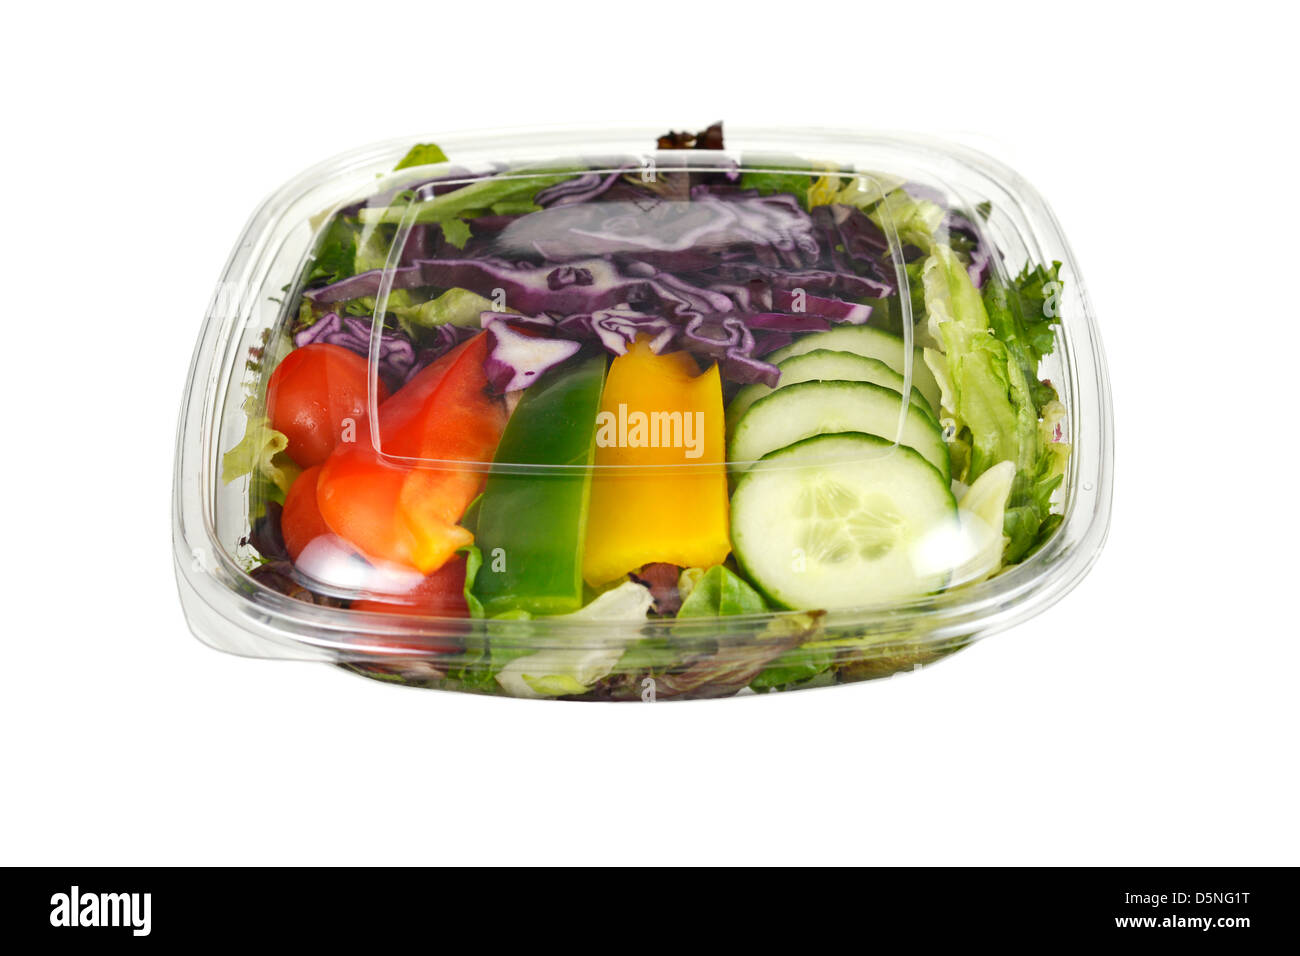 Verpackte Salat, Salat in Kunststoffbehälter Stockbild